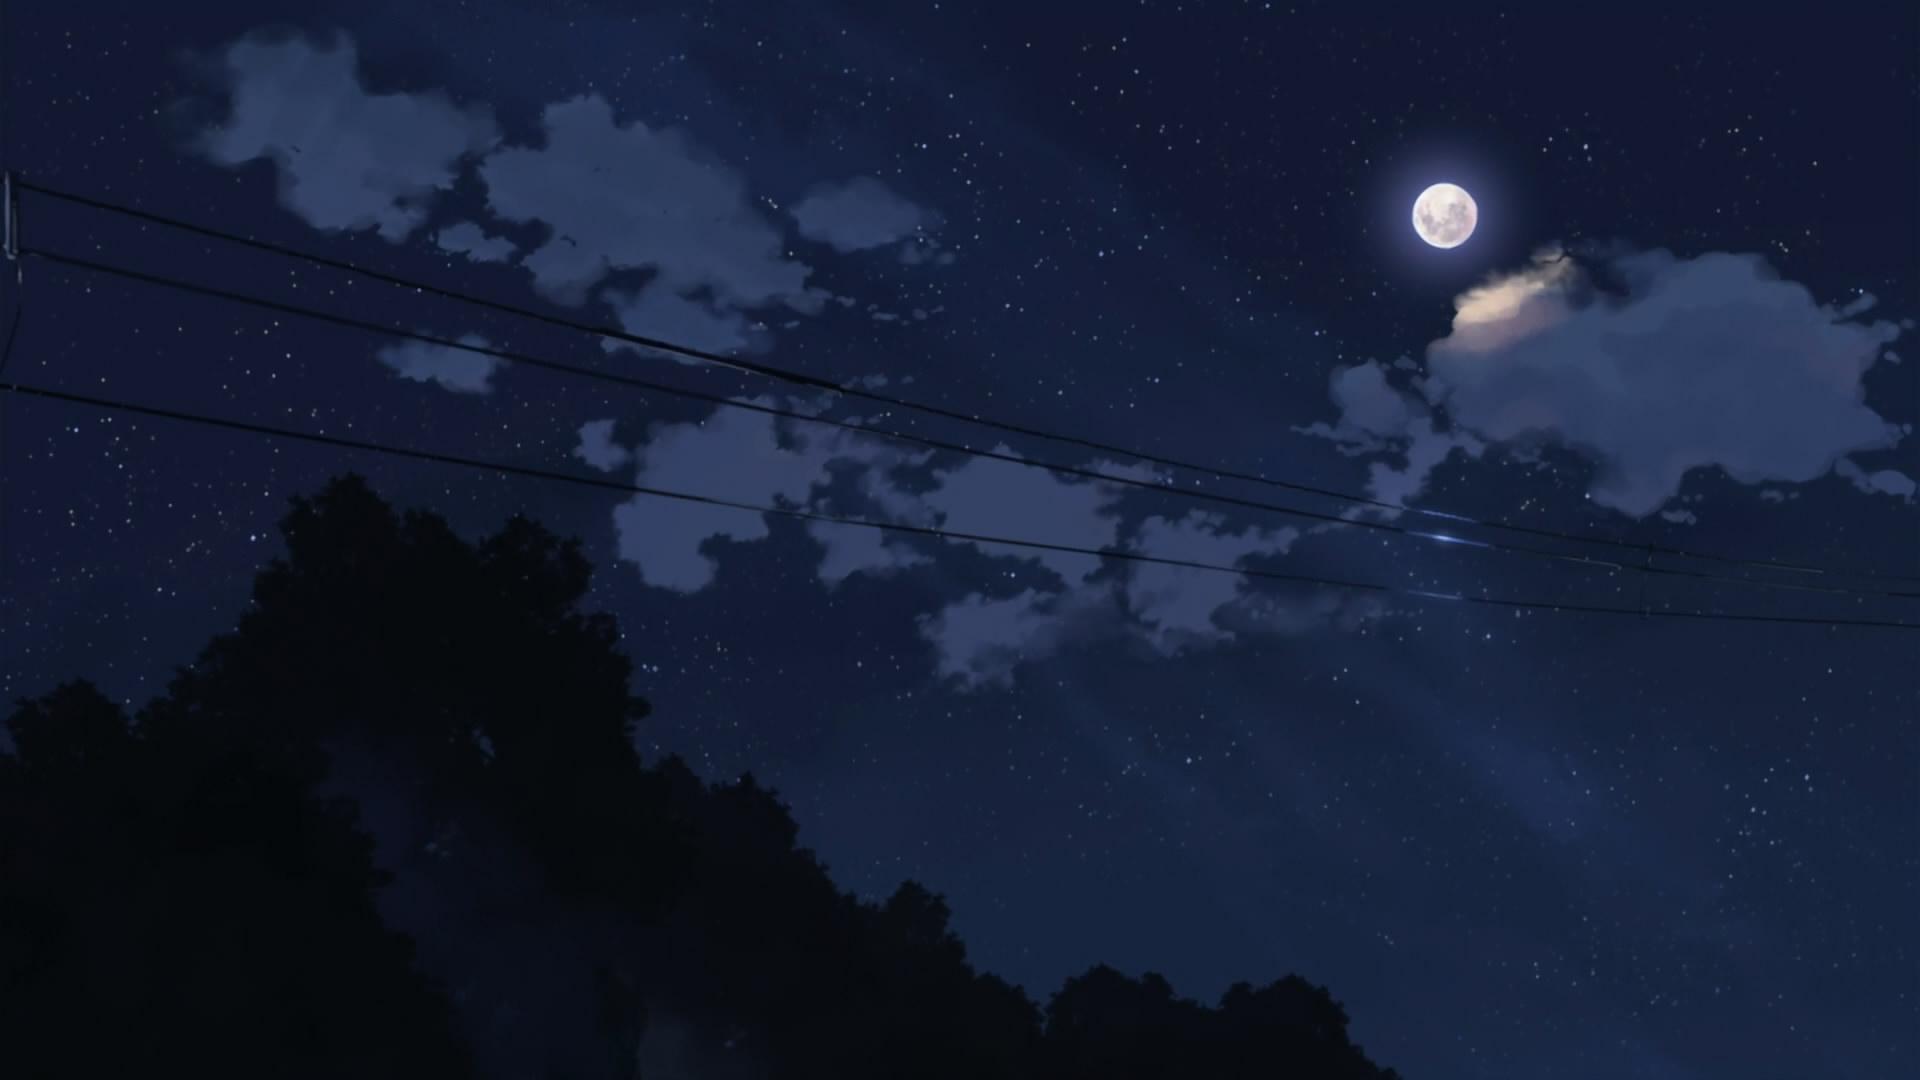 Download Anime Night Sky Wallpaper 5776 1920x1080 px High 1920x1080